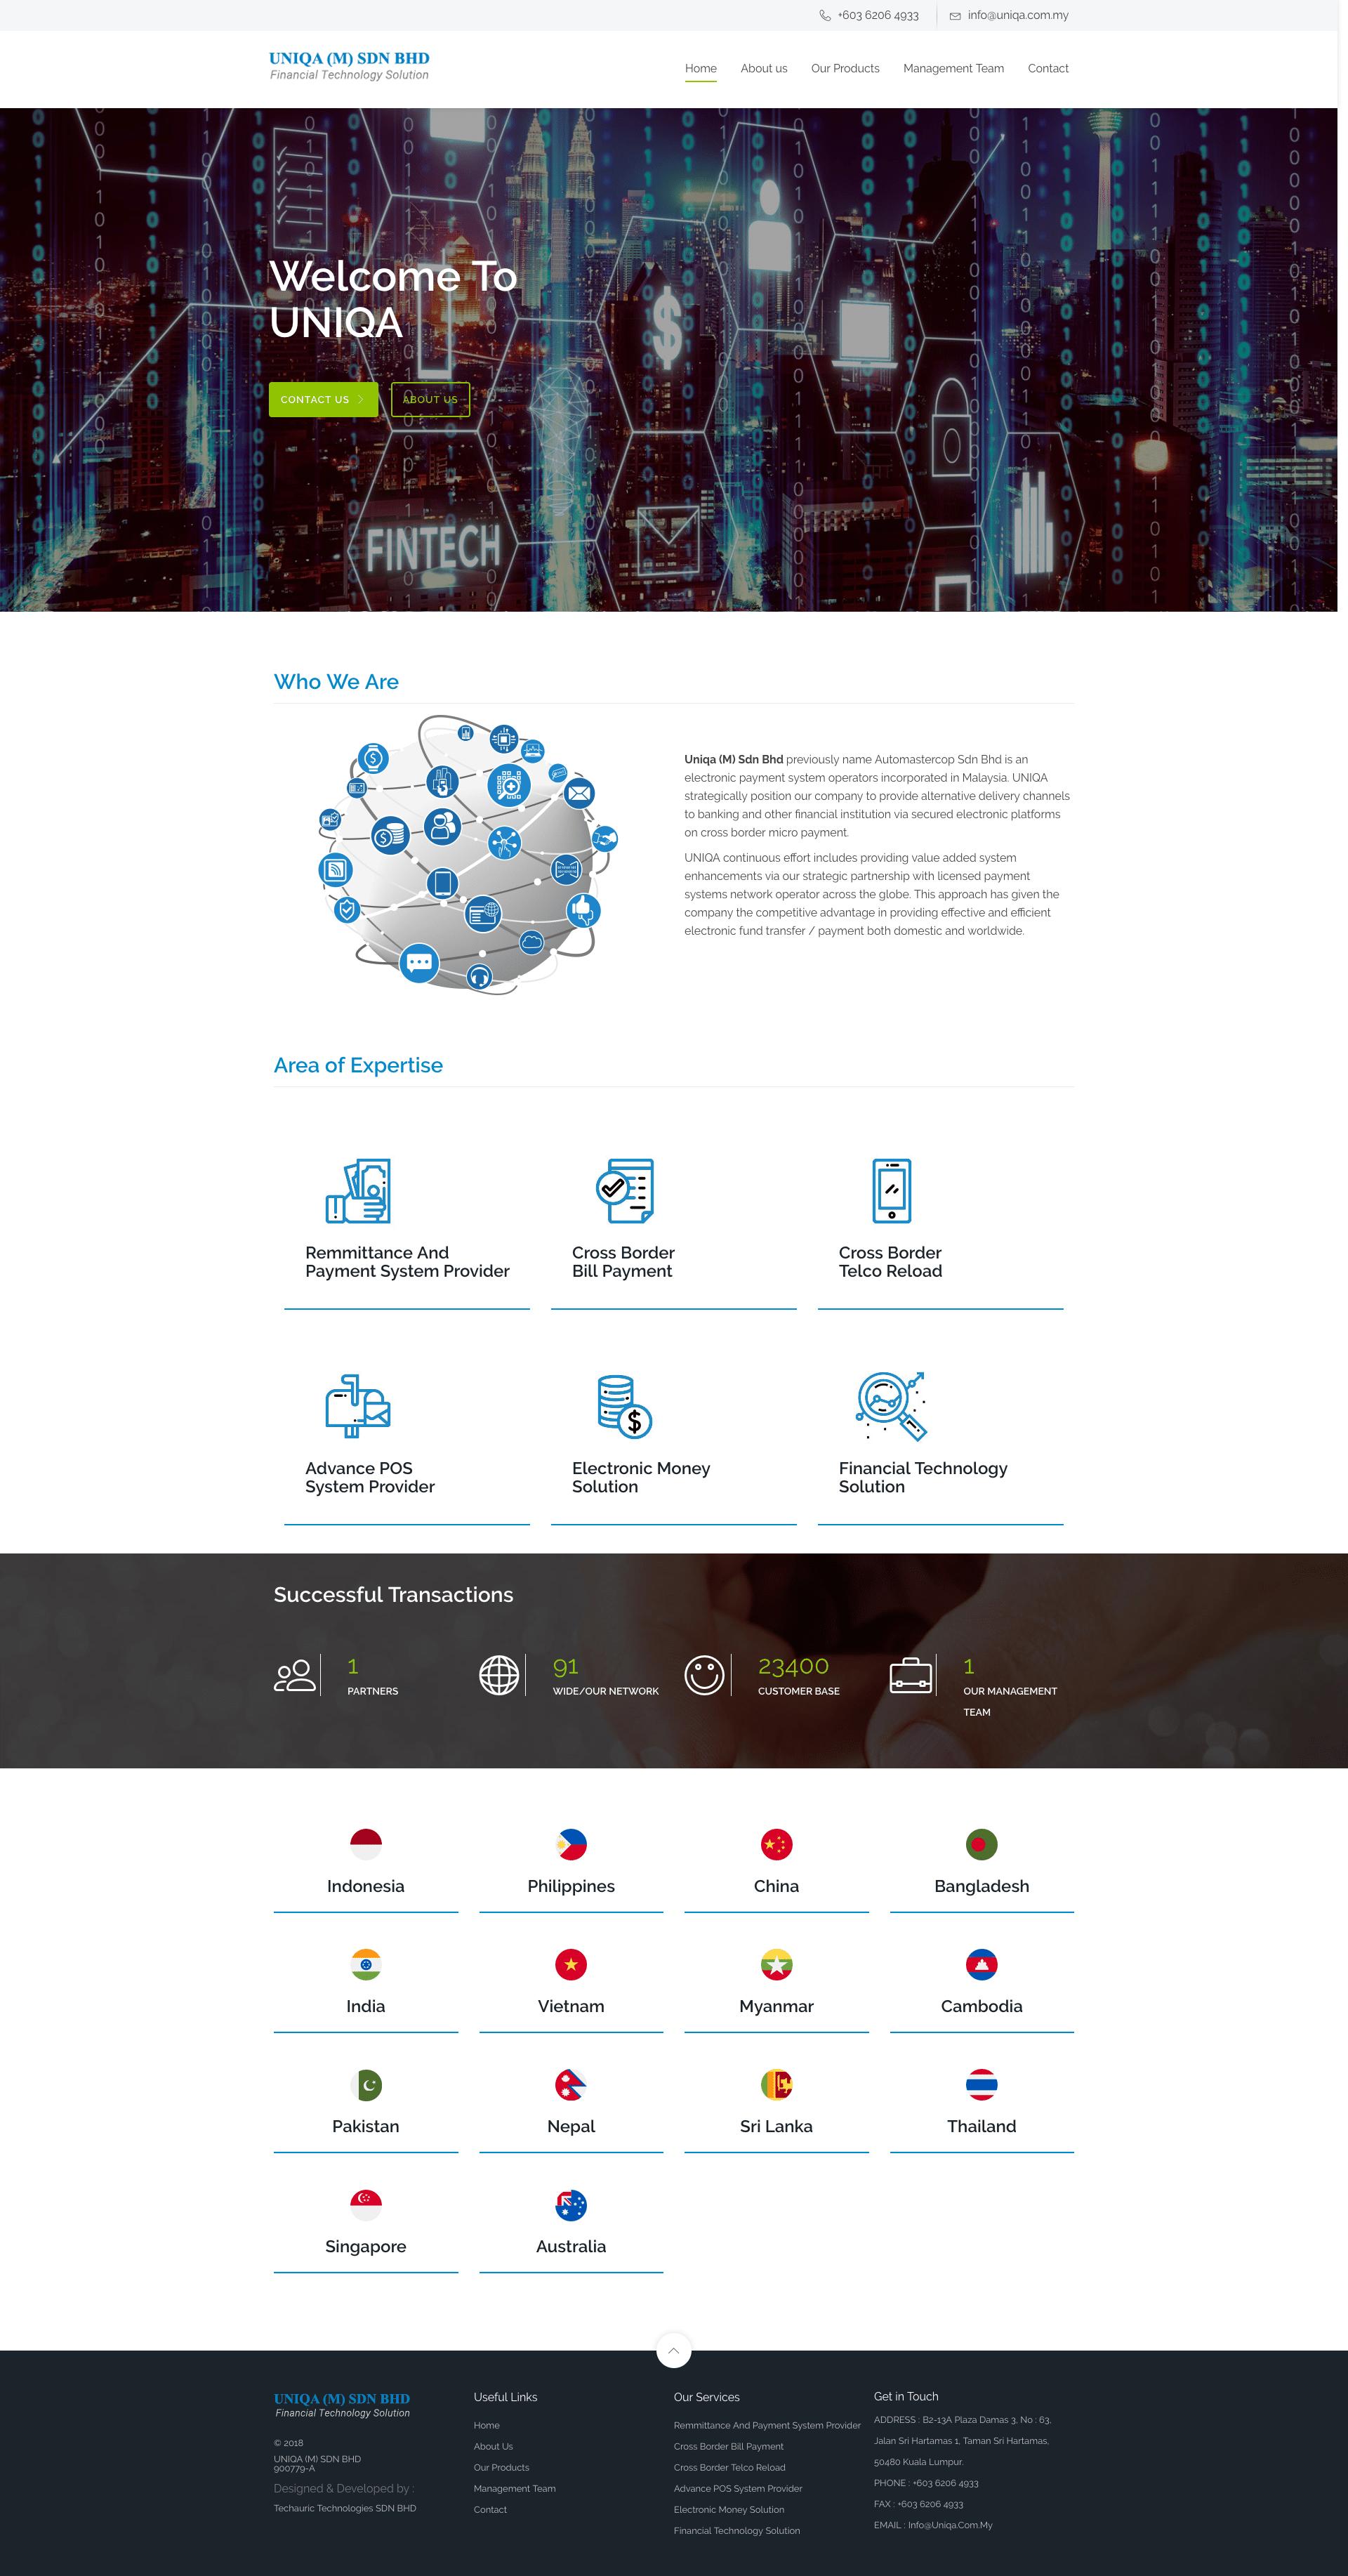 screencapture-uniqa-my-index-html-2019-05-30-16_19_26